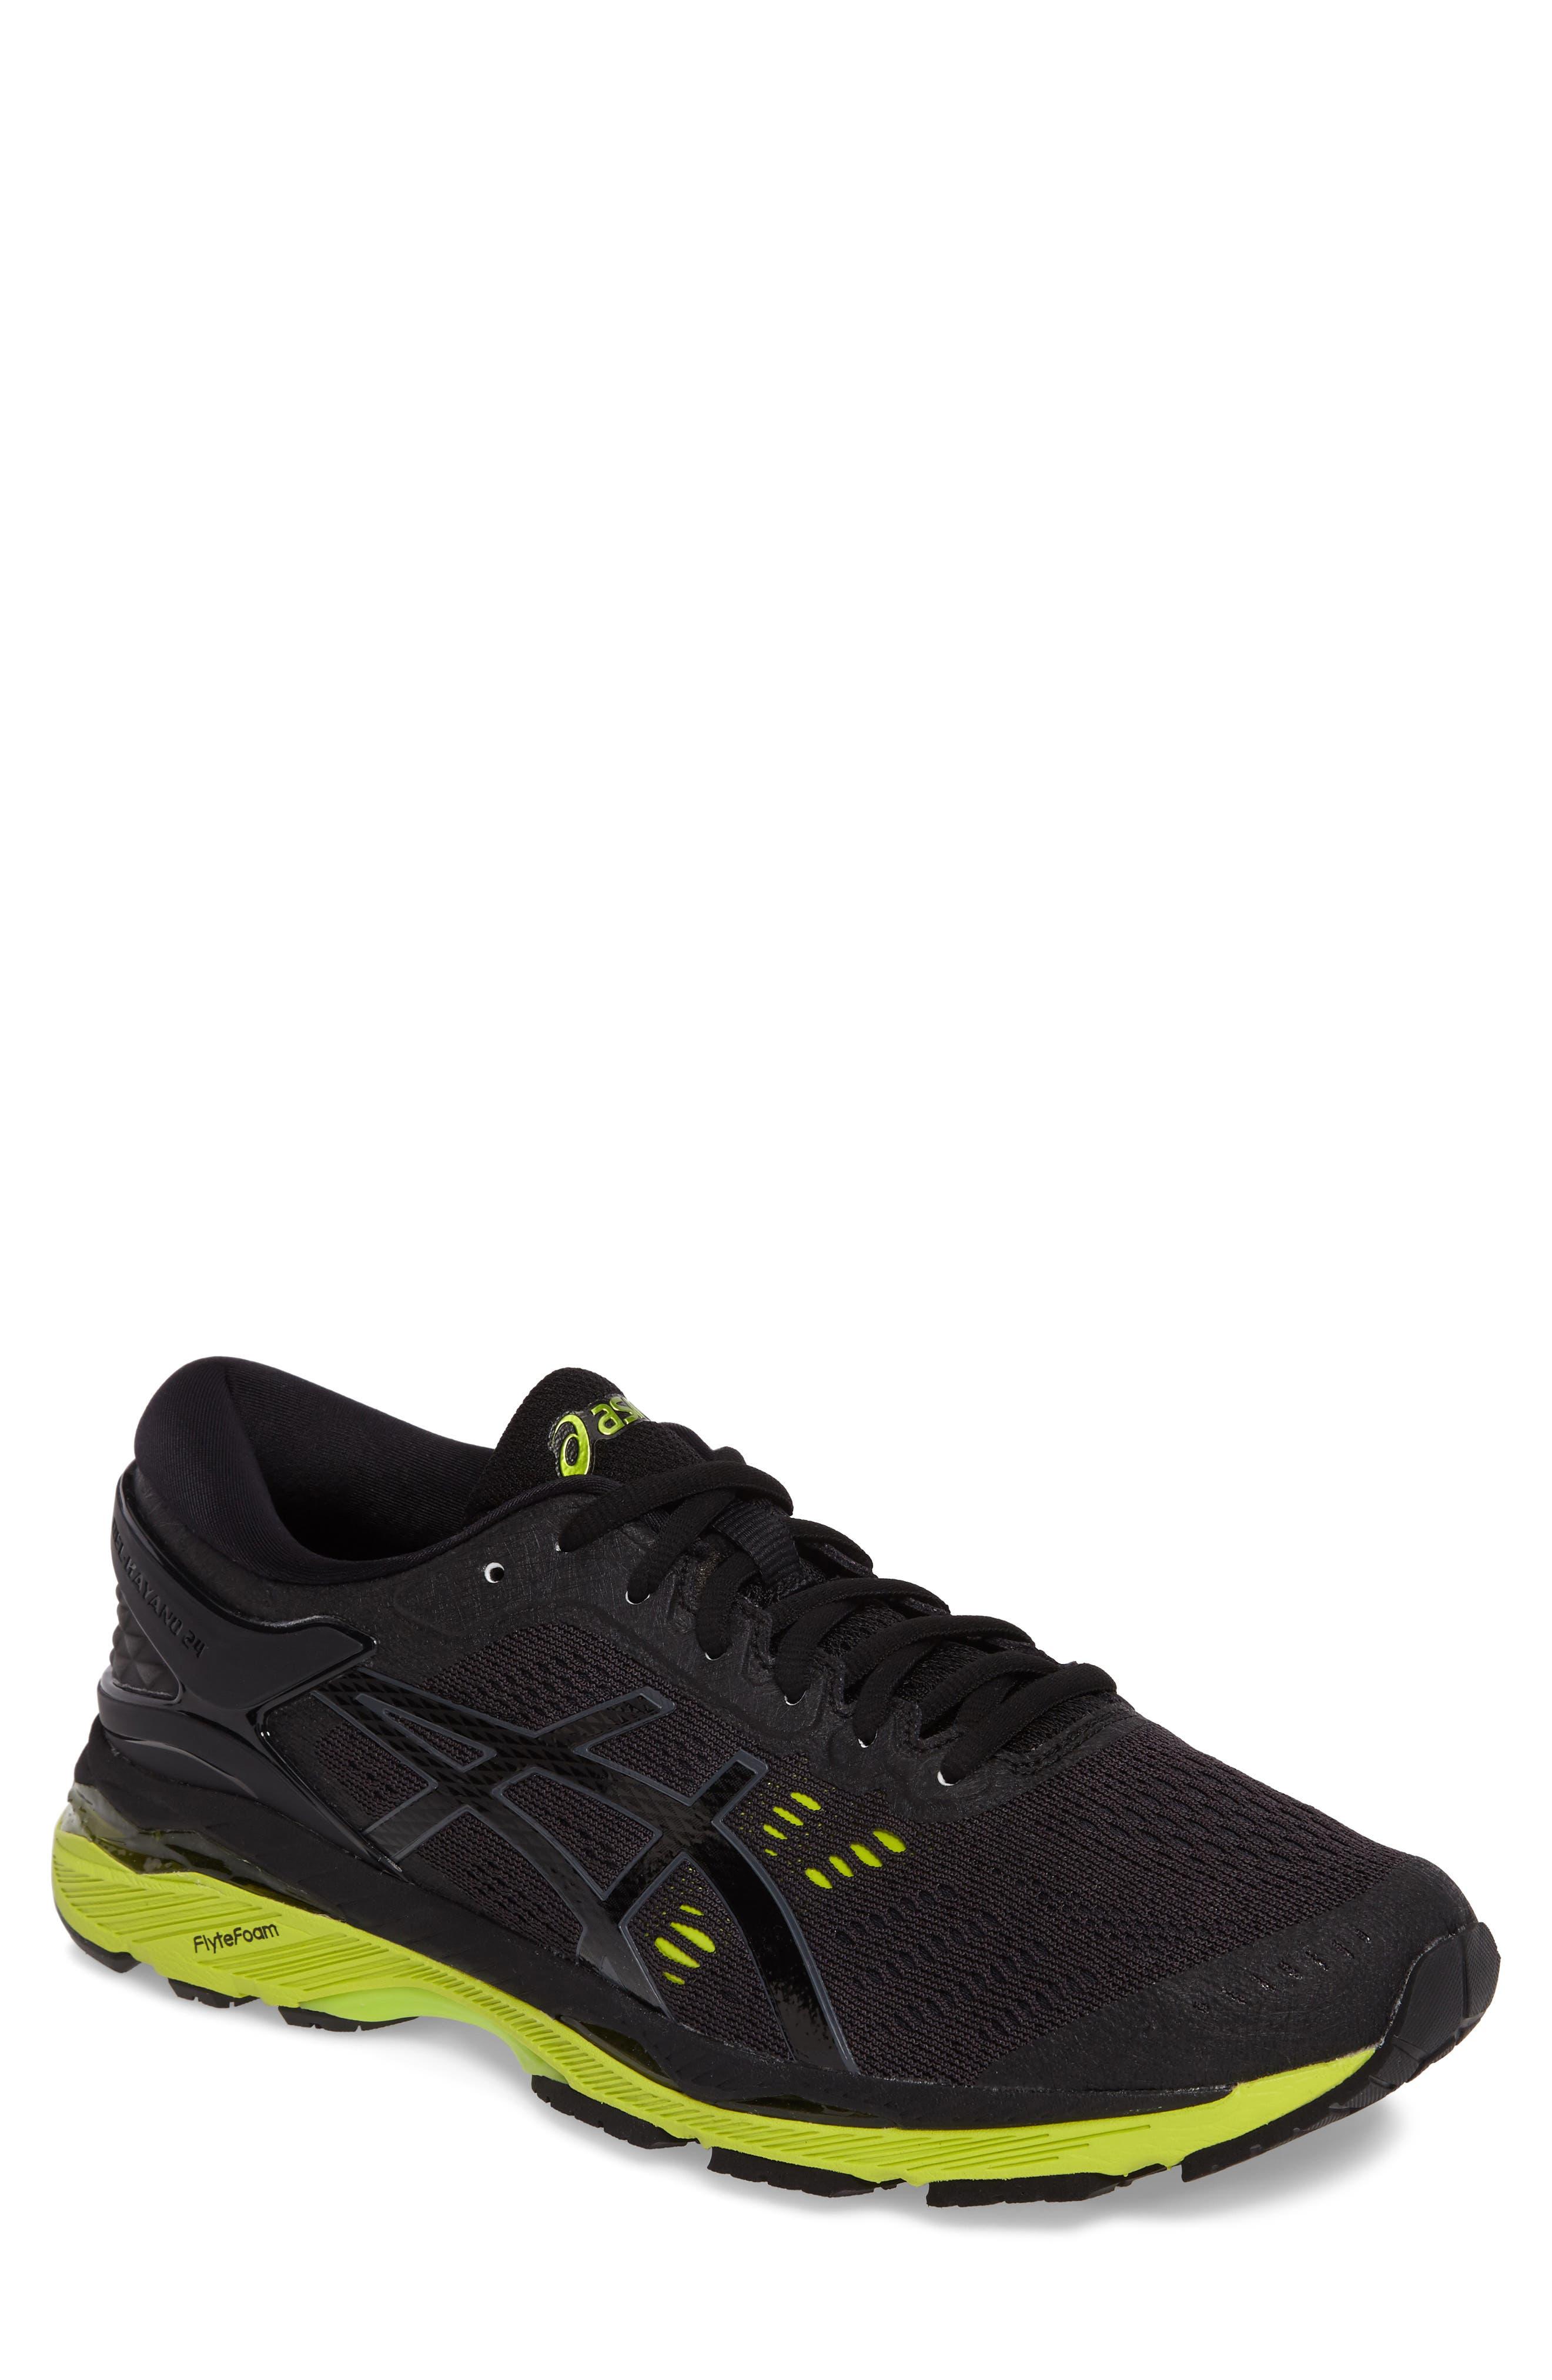 GEL-Kayano 24 Running Shoe,                         Main,                         color, 005